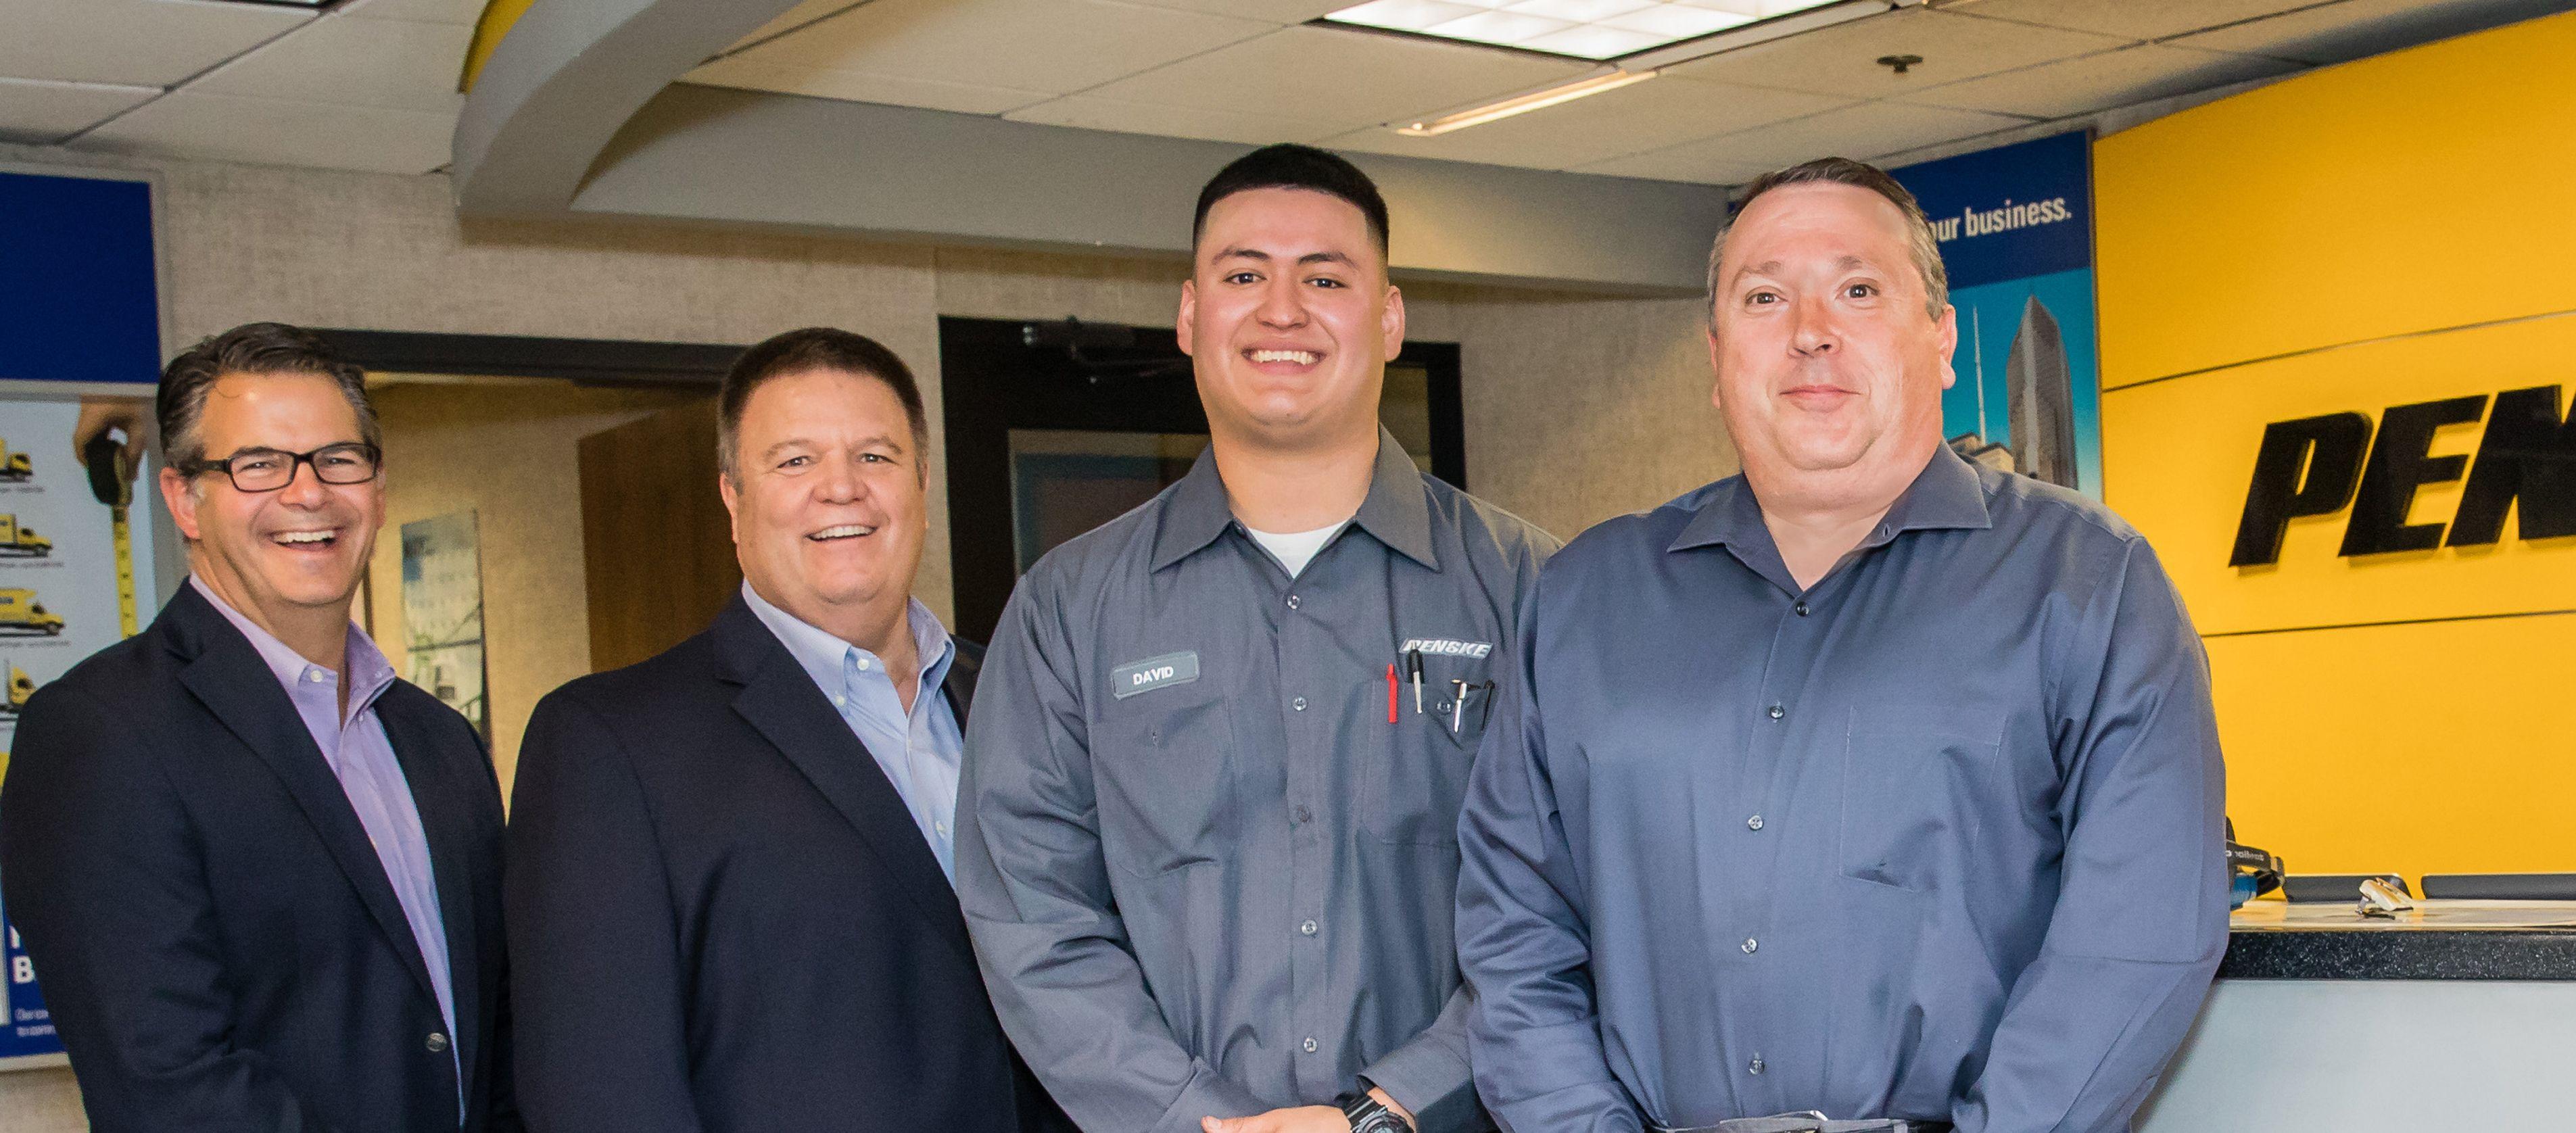 Penske Truck Leasing Completes 1 Millionth Voice-Directed Preventive Maintenance Inspection